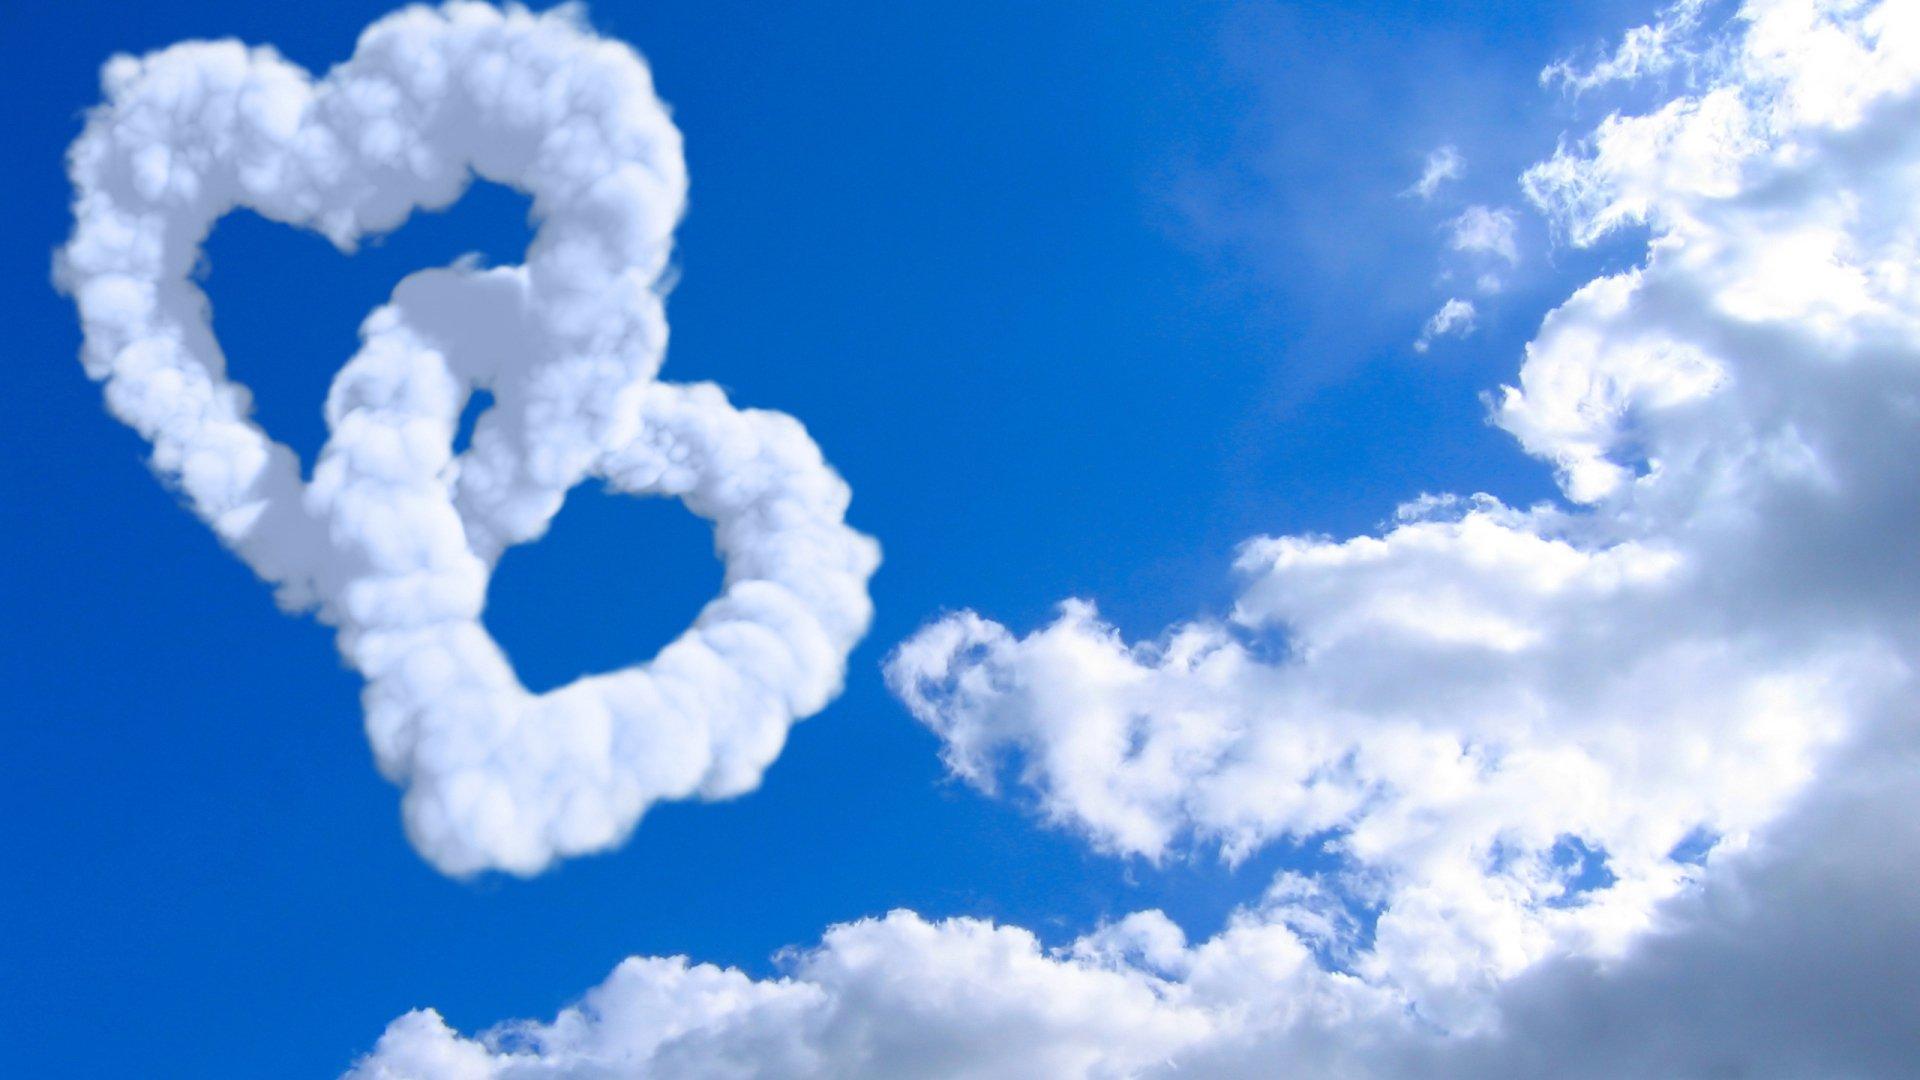 Artistic - Love  Sky Heart Cloud Blue Nature Wallpaper